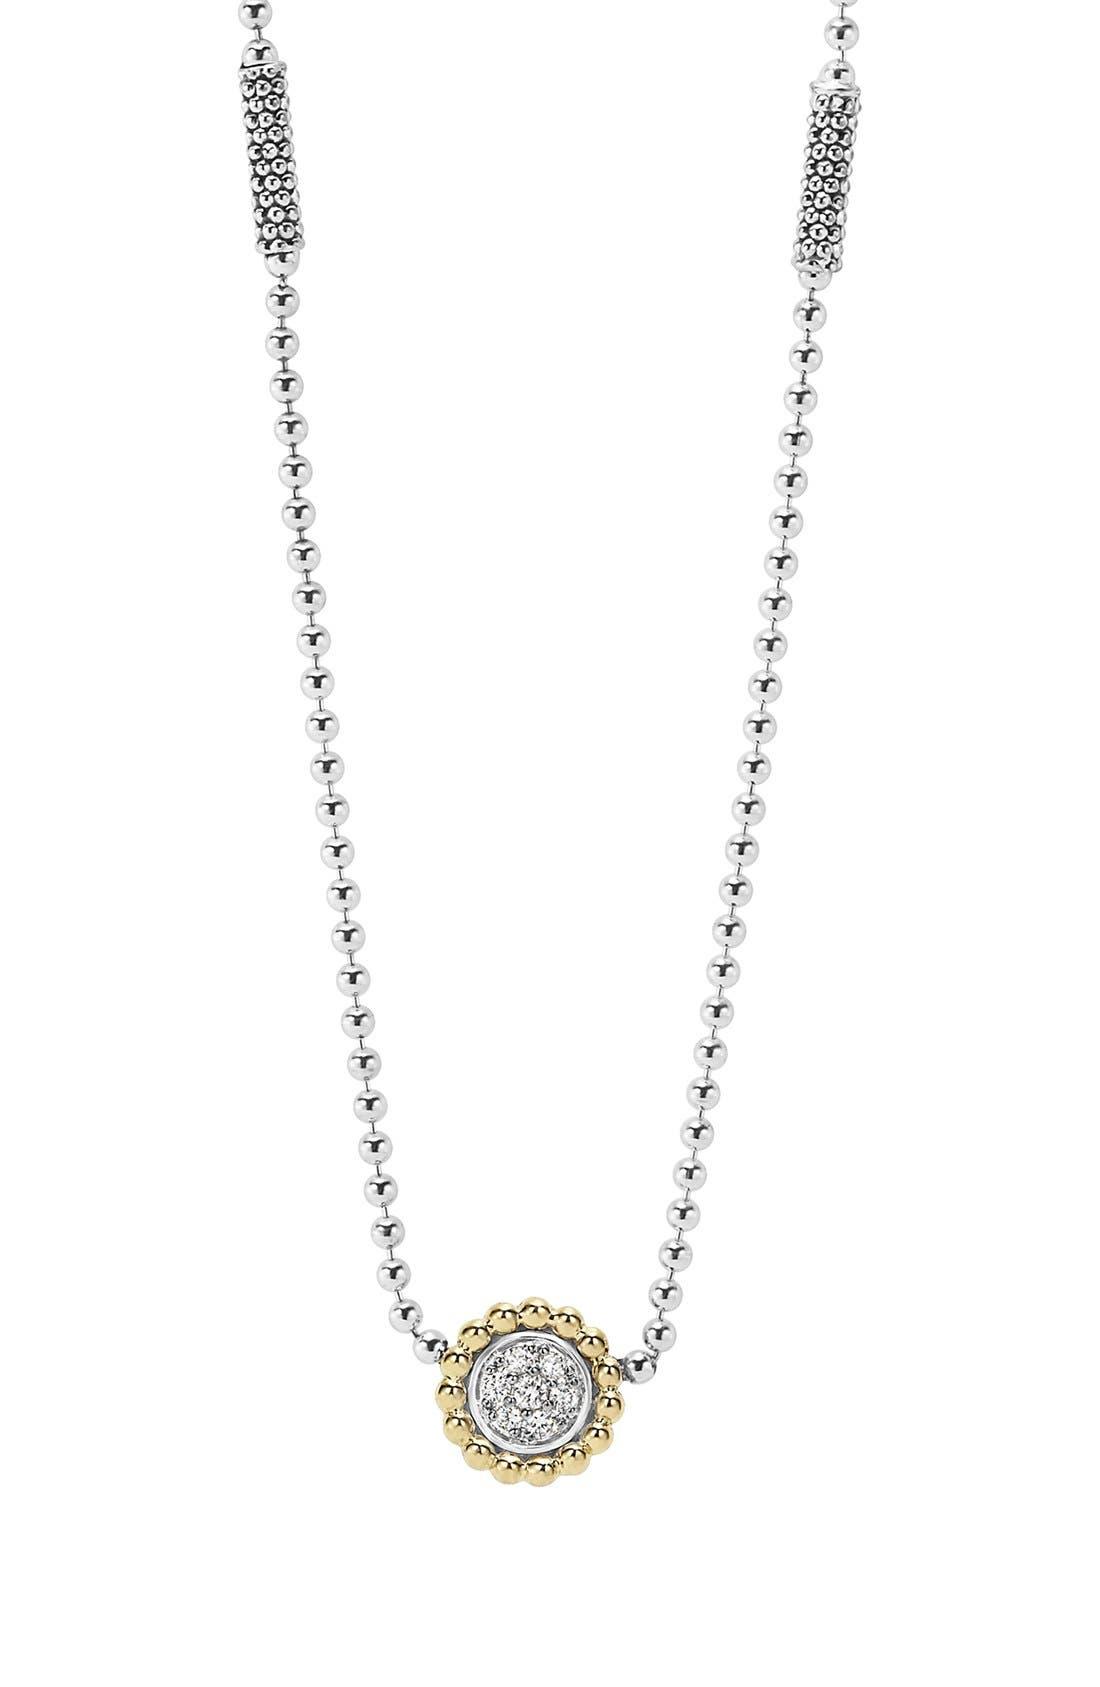 Main Image - LAGOS 'Caviar' Circle Pendant Necklace